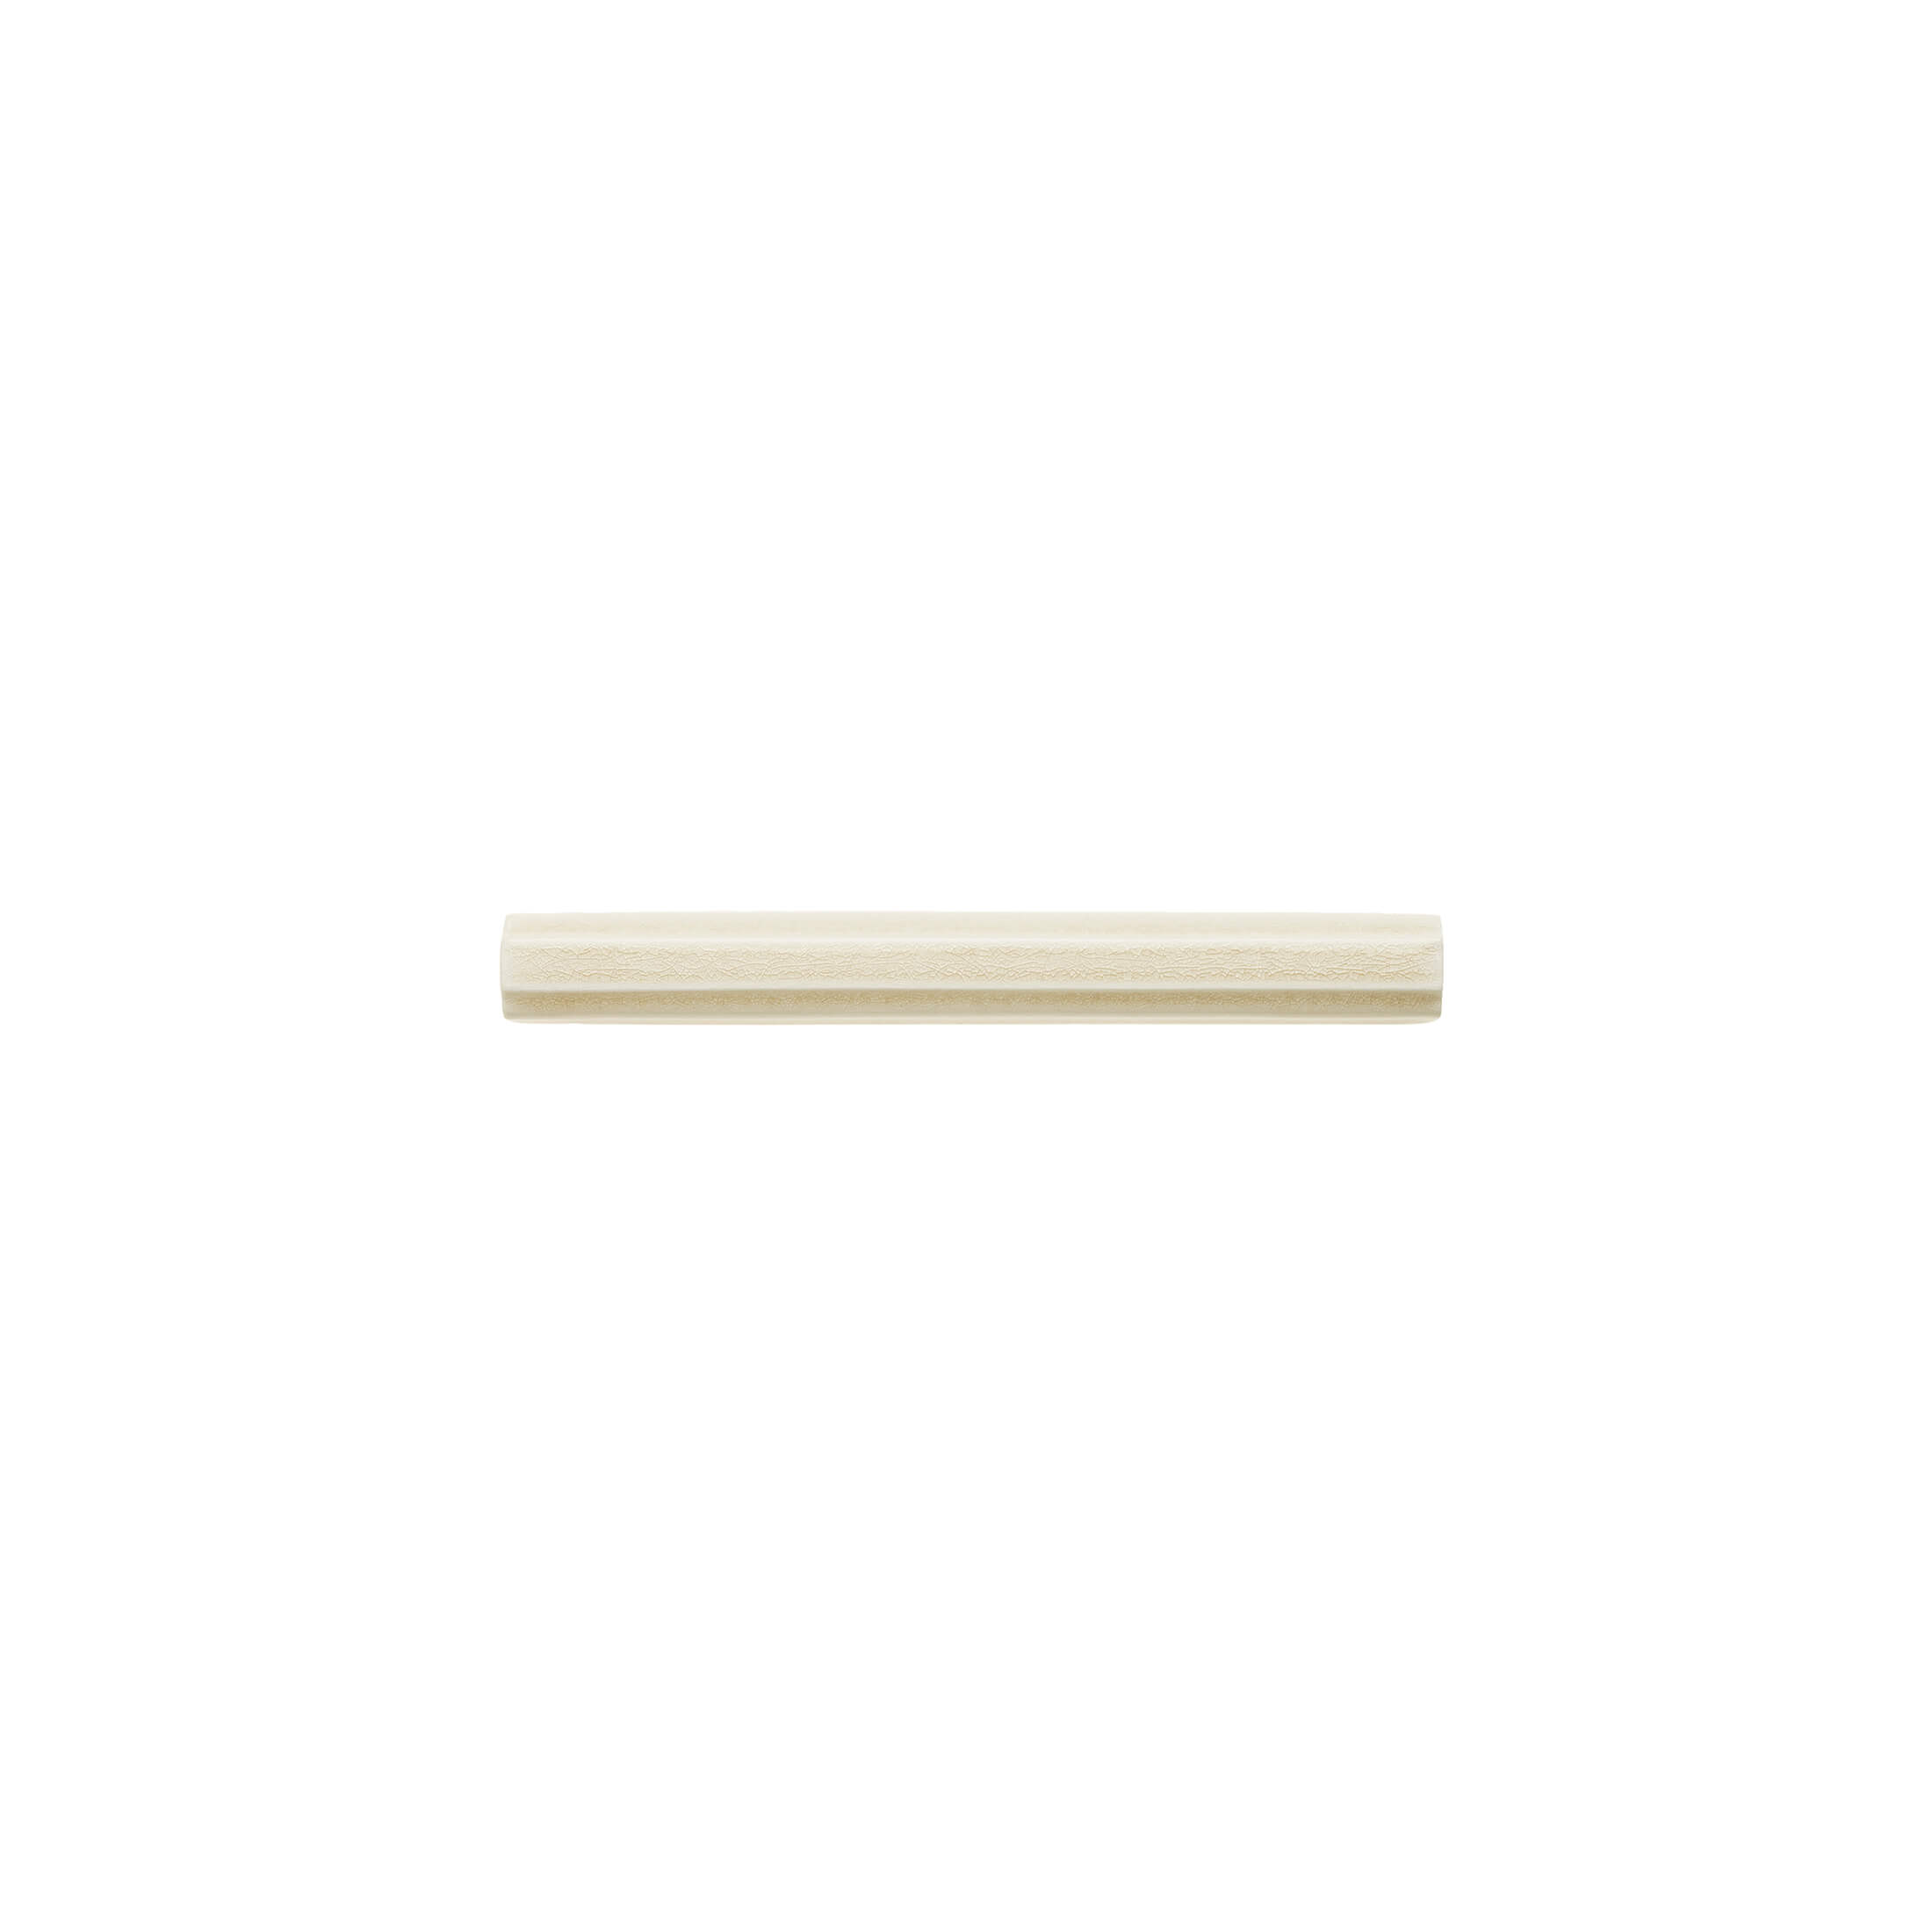 ADOC5045 - LISTELO  - 1.7 cm X 15 cm